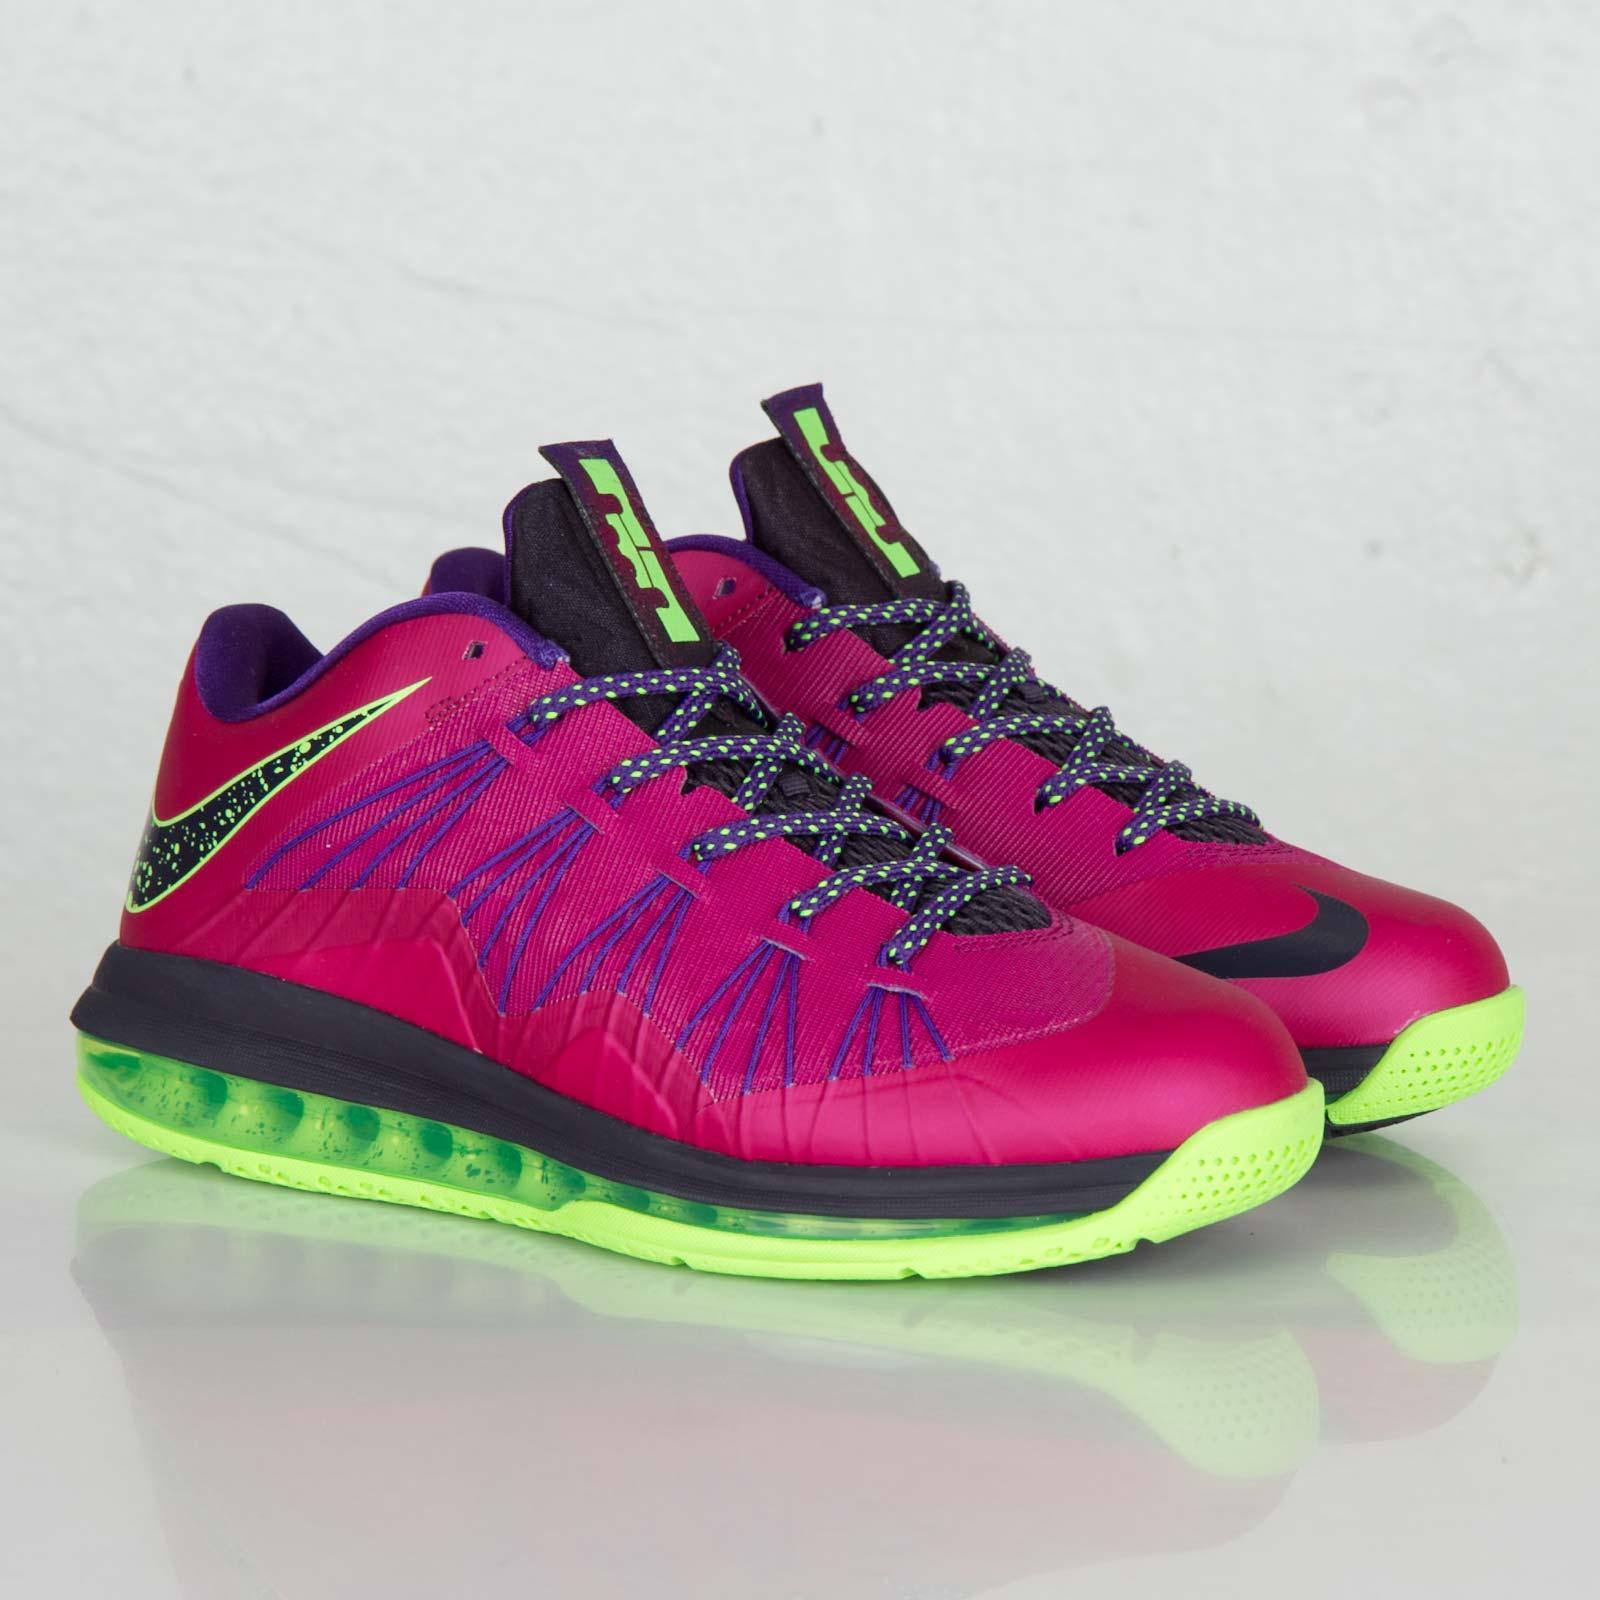 aa64280676d Nike Air Max Lebron X Low - 579765-601 - Sneakersnstuff